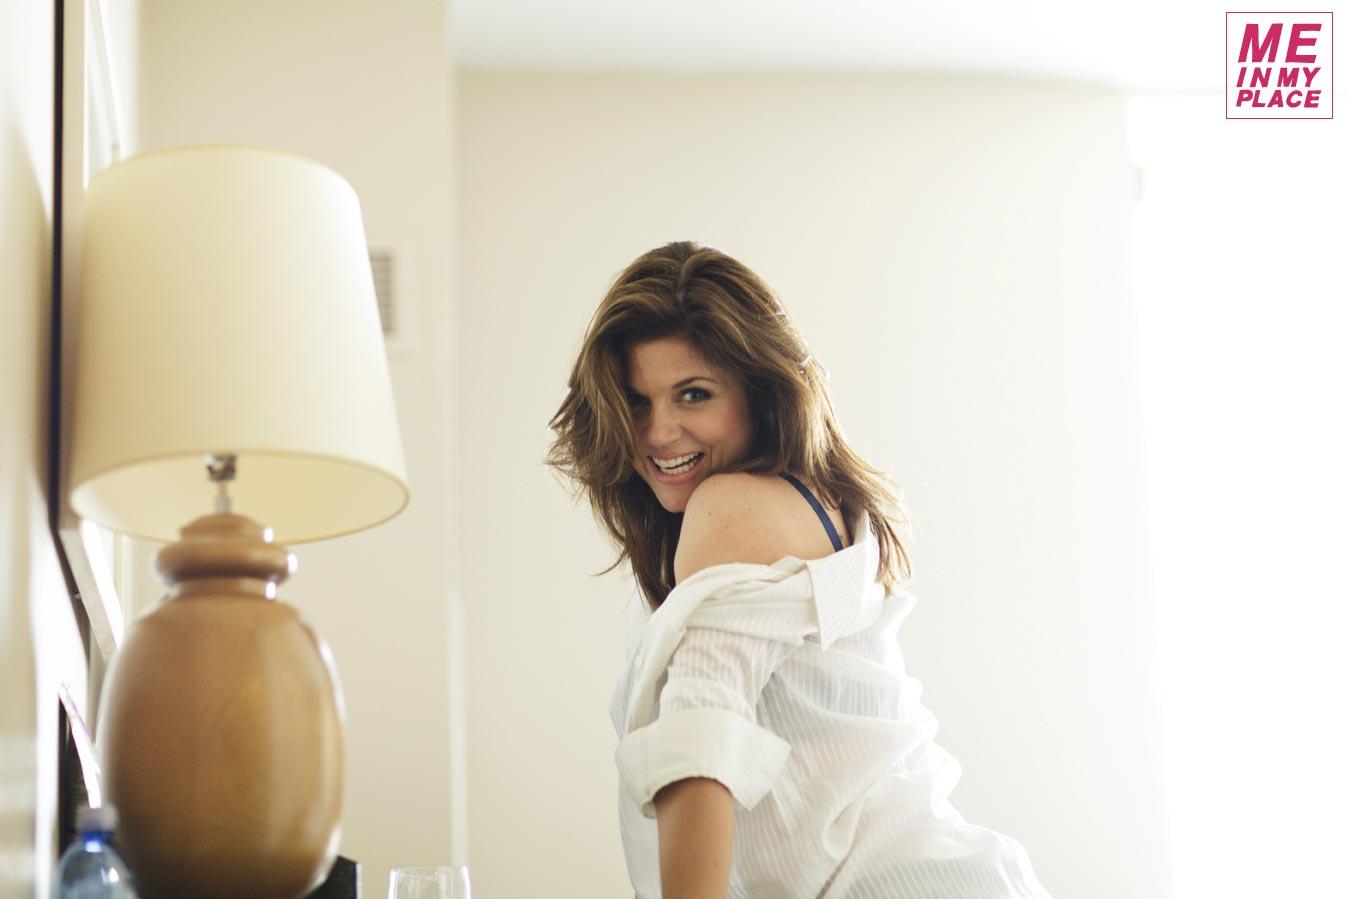 Tiffani Thiessen - Me In My Place Photos-16 - GotCeleb Tiffani Thiessen 2013 Me In My Place